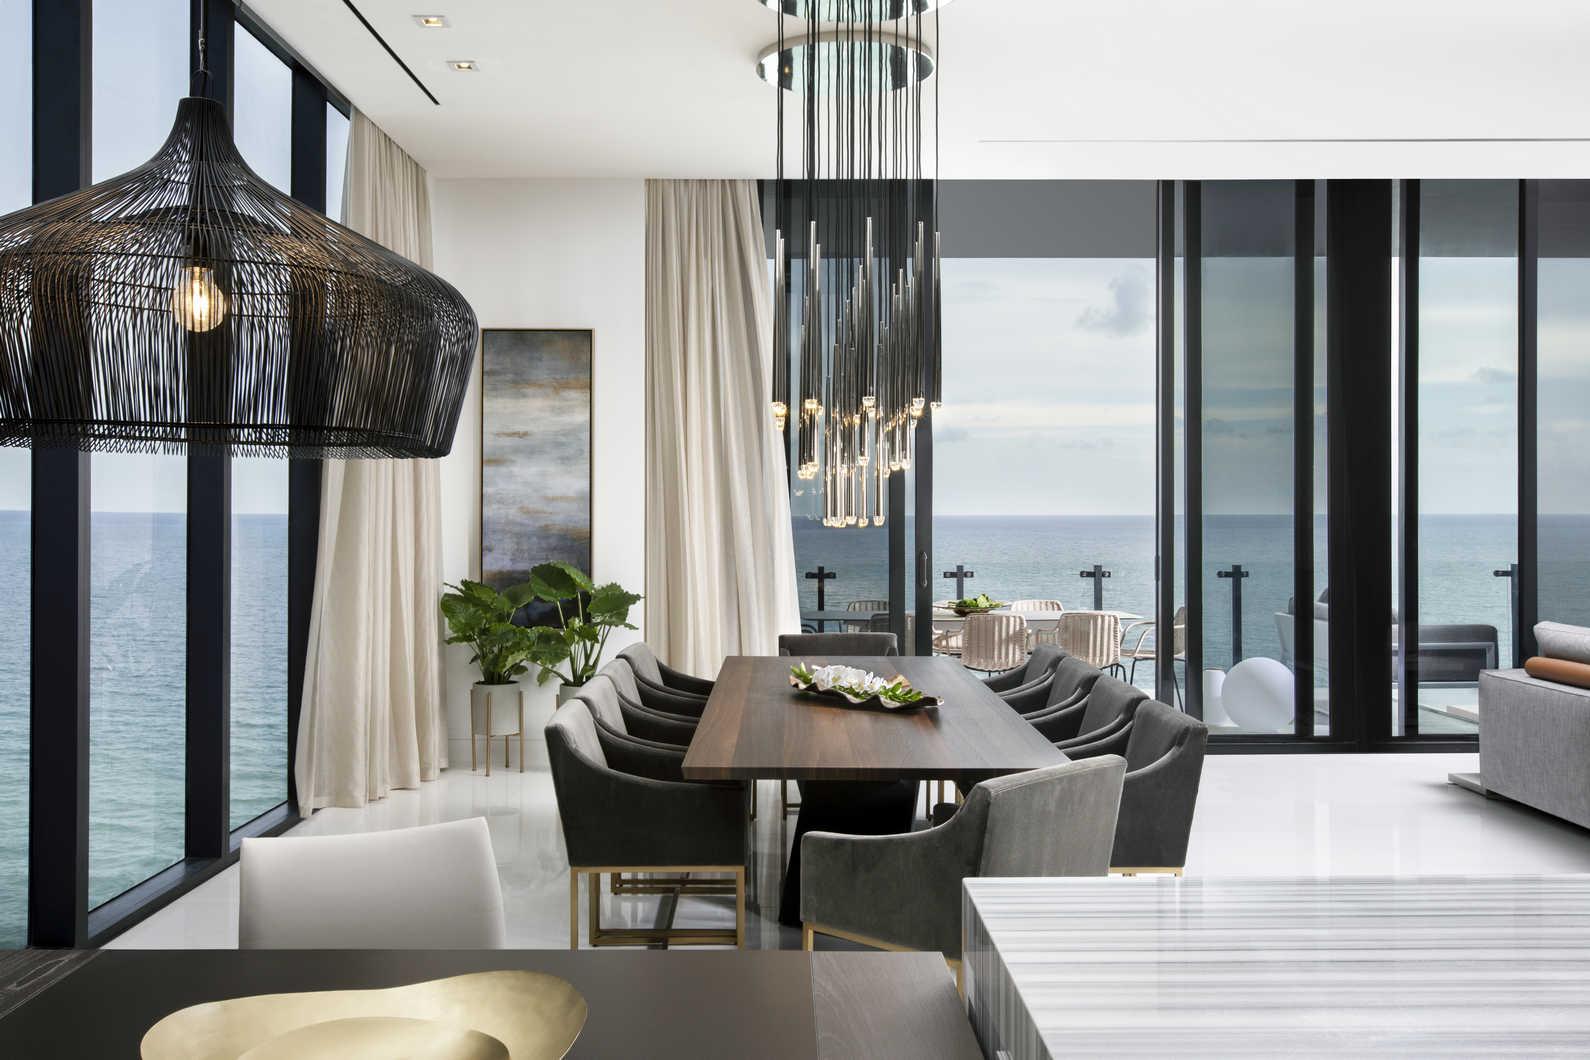 5_Luxe-Waterfront-Condo-DiningRoom-DKOR-Interiors.jpg